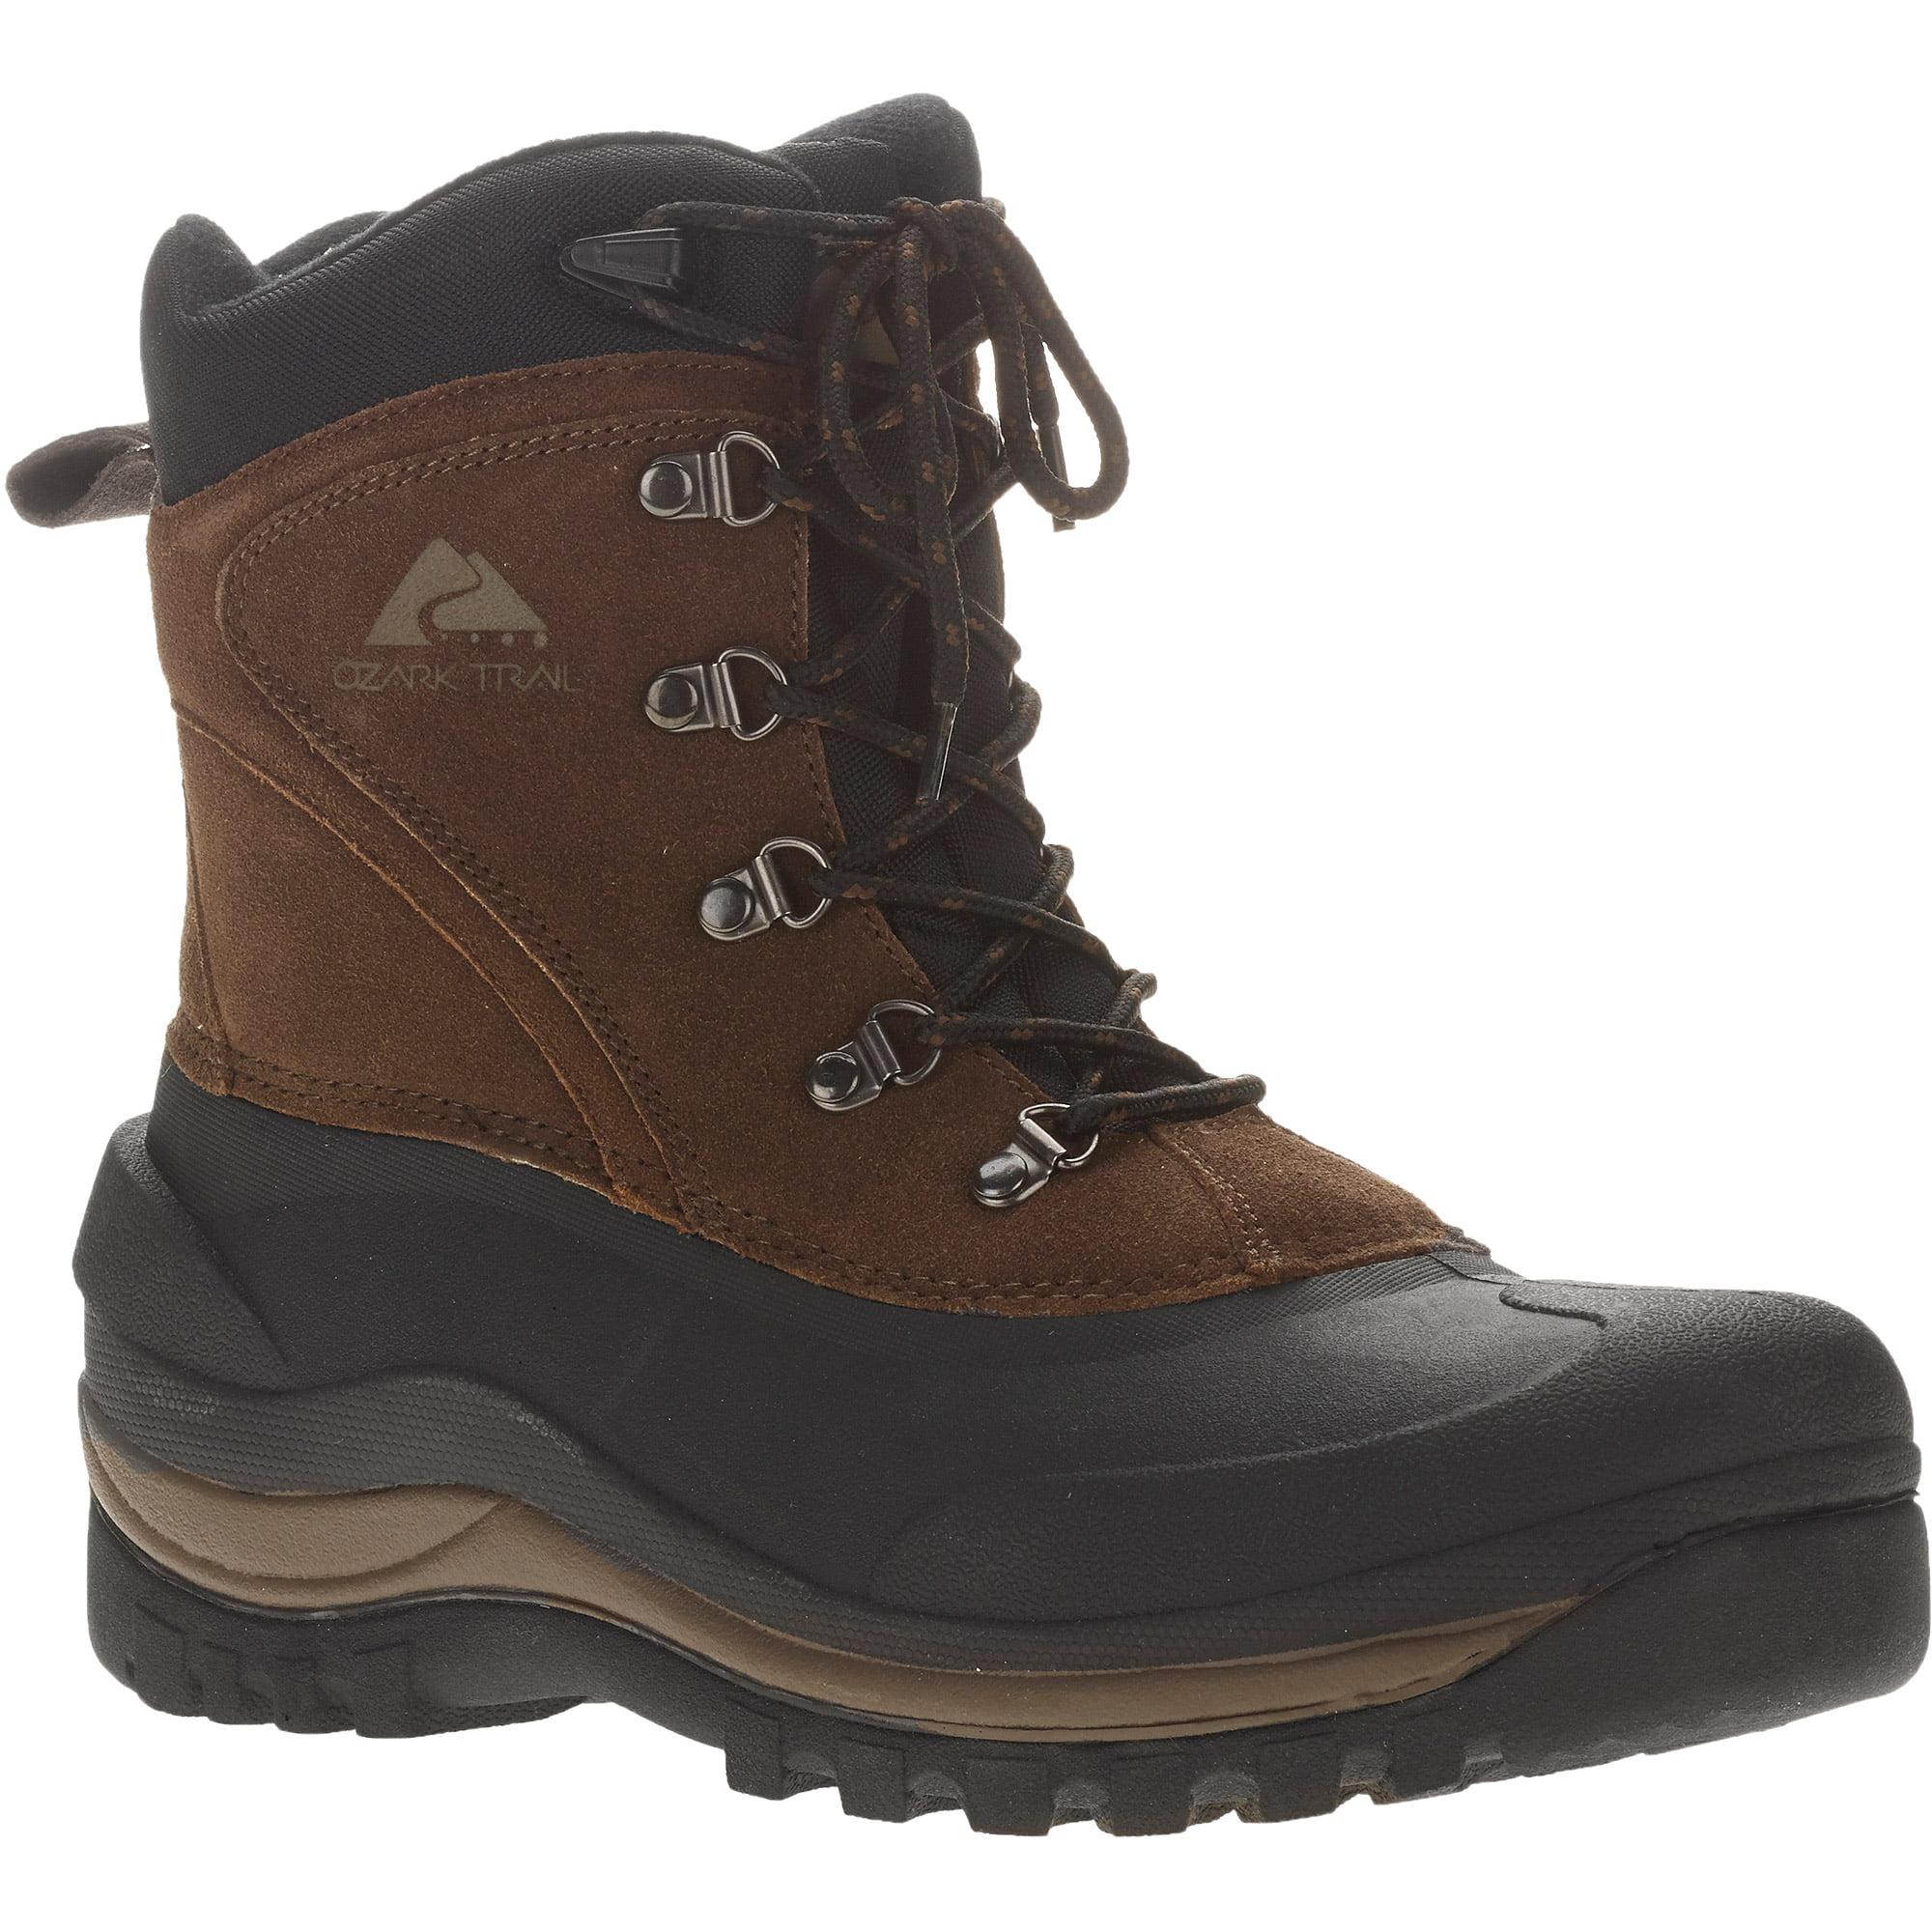 ozark trail men u0027s brown pac winter boots walmart com